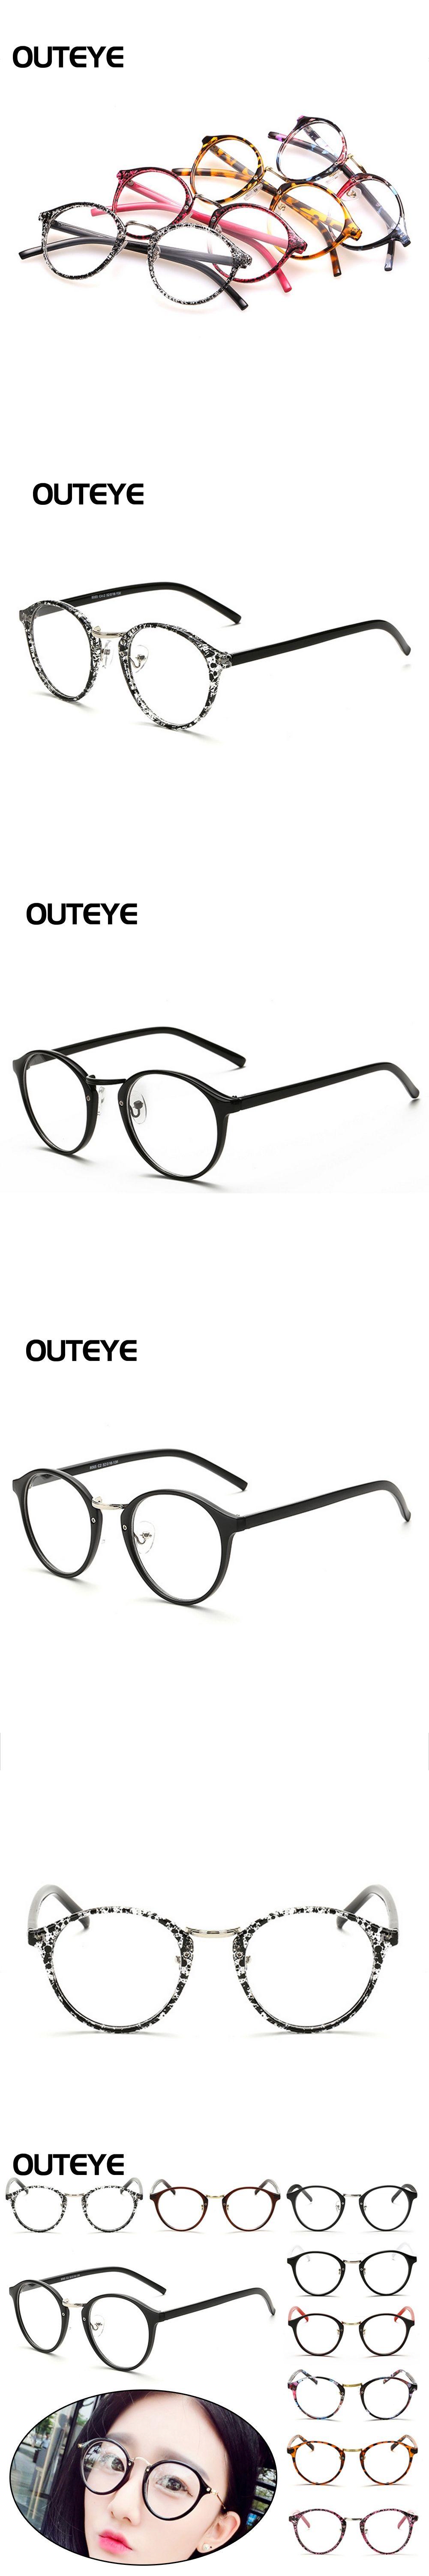 0b00fee2086 OUTEYE Round Optical Frame Women Vintage Glasses Frame Plain Mirror Harajuku  Girl Eyeglass Clear Lens oculos feminino de grau W2